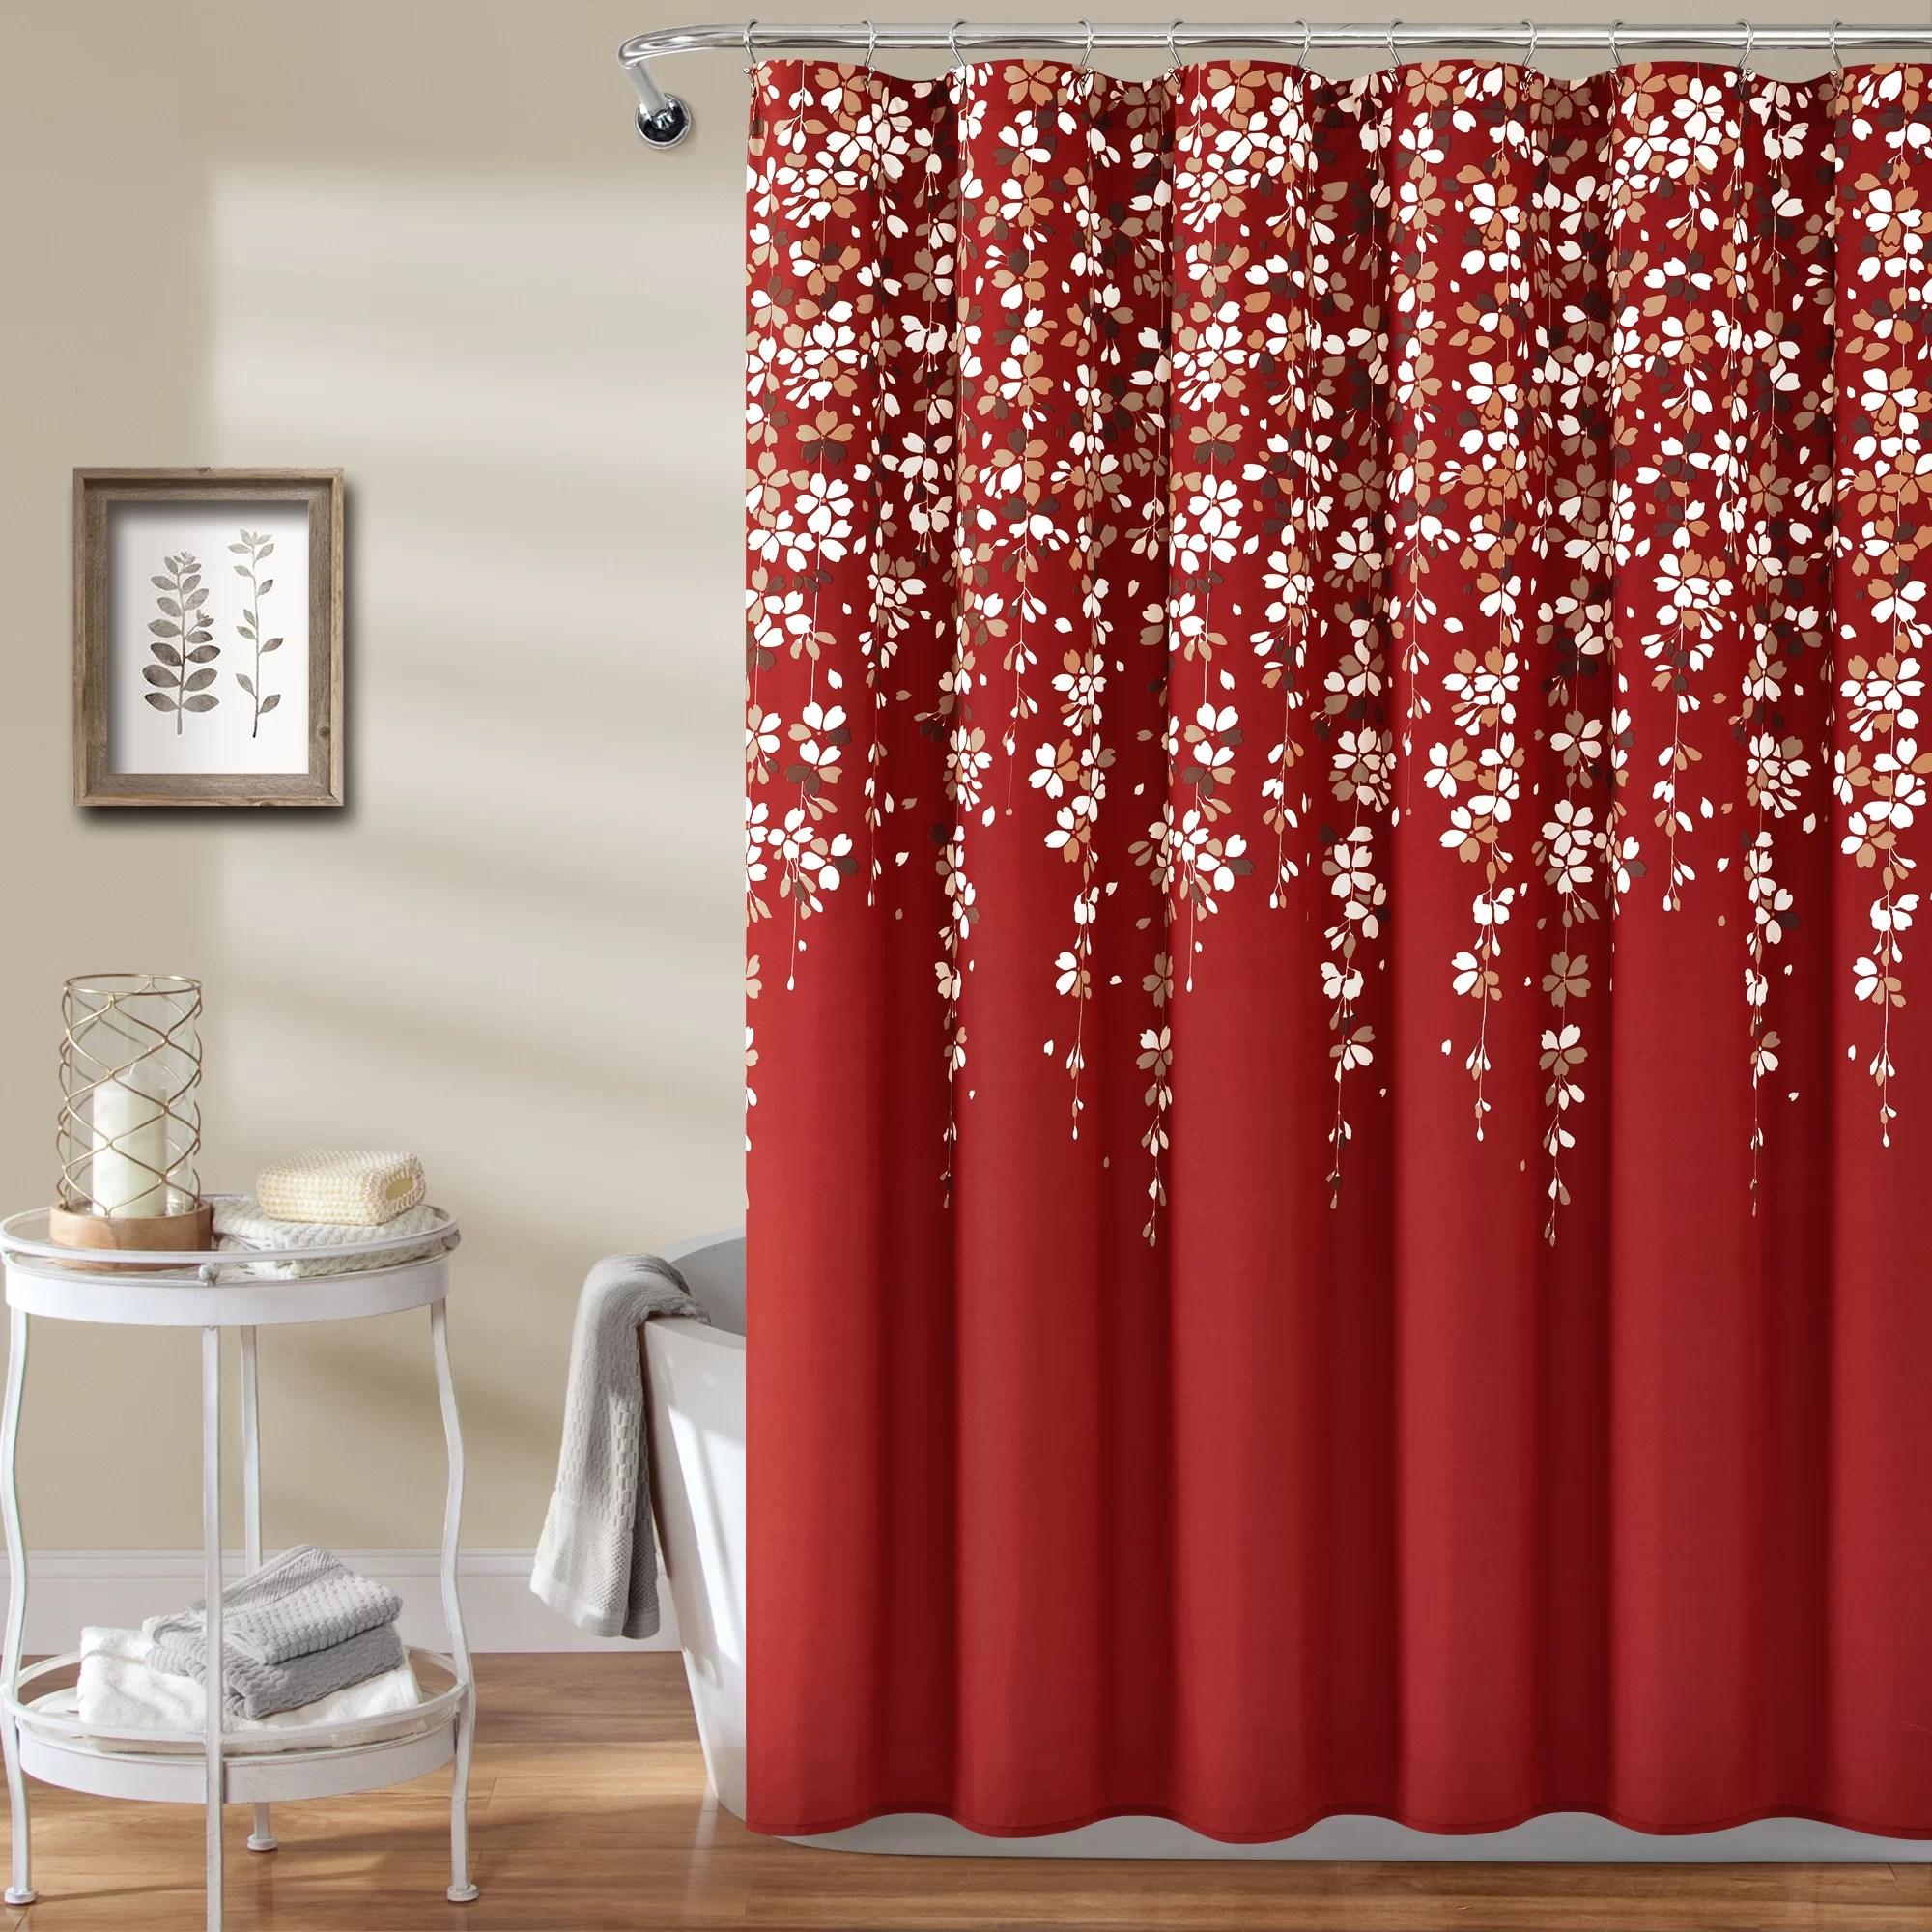 black red shower curtains shower